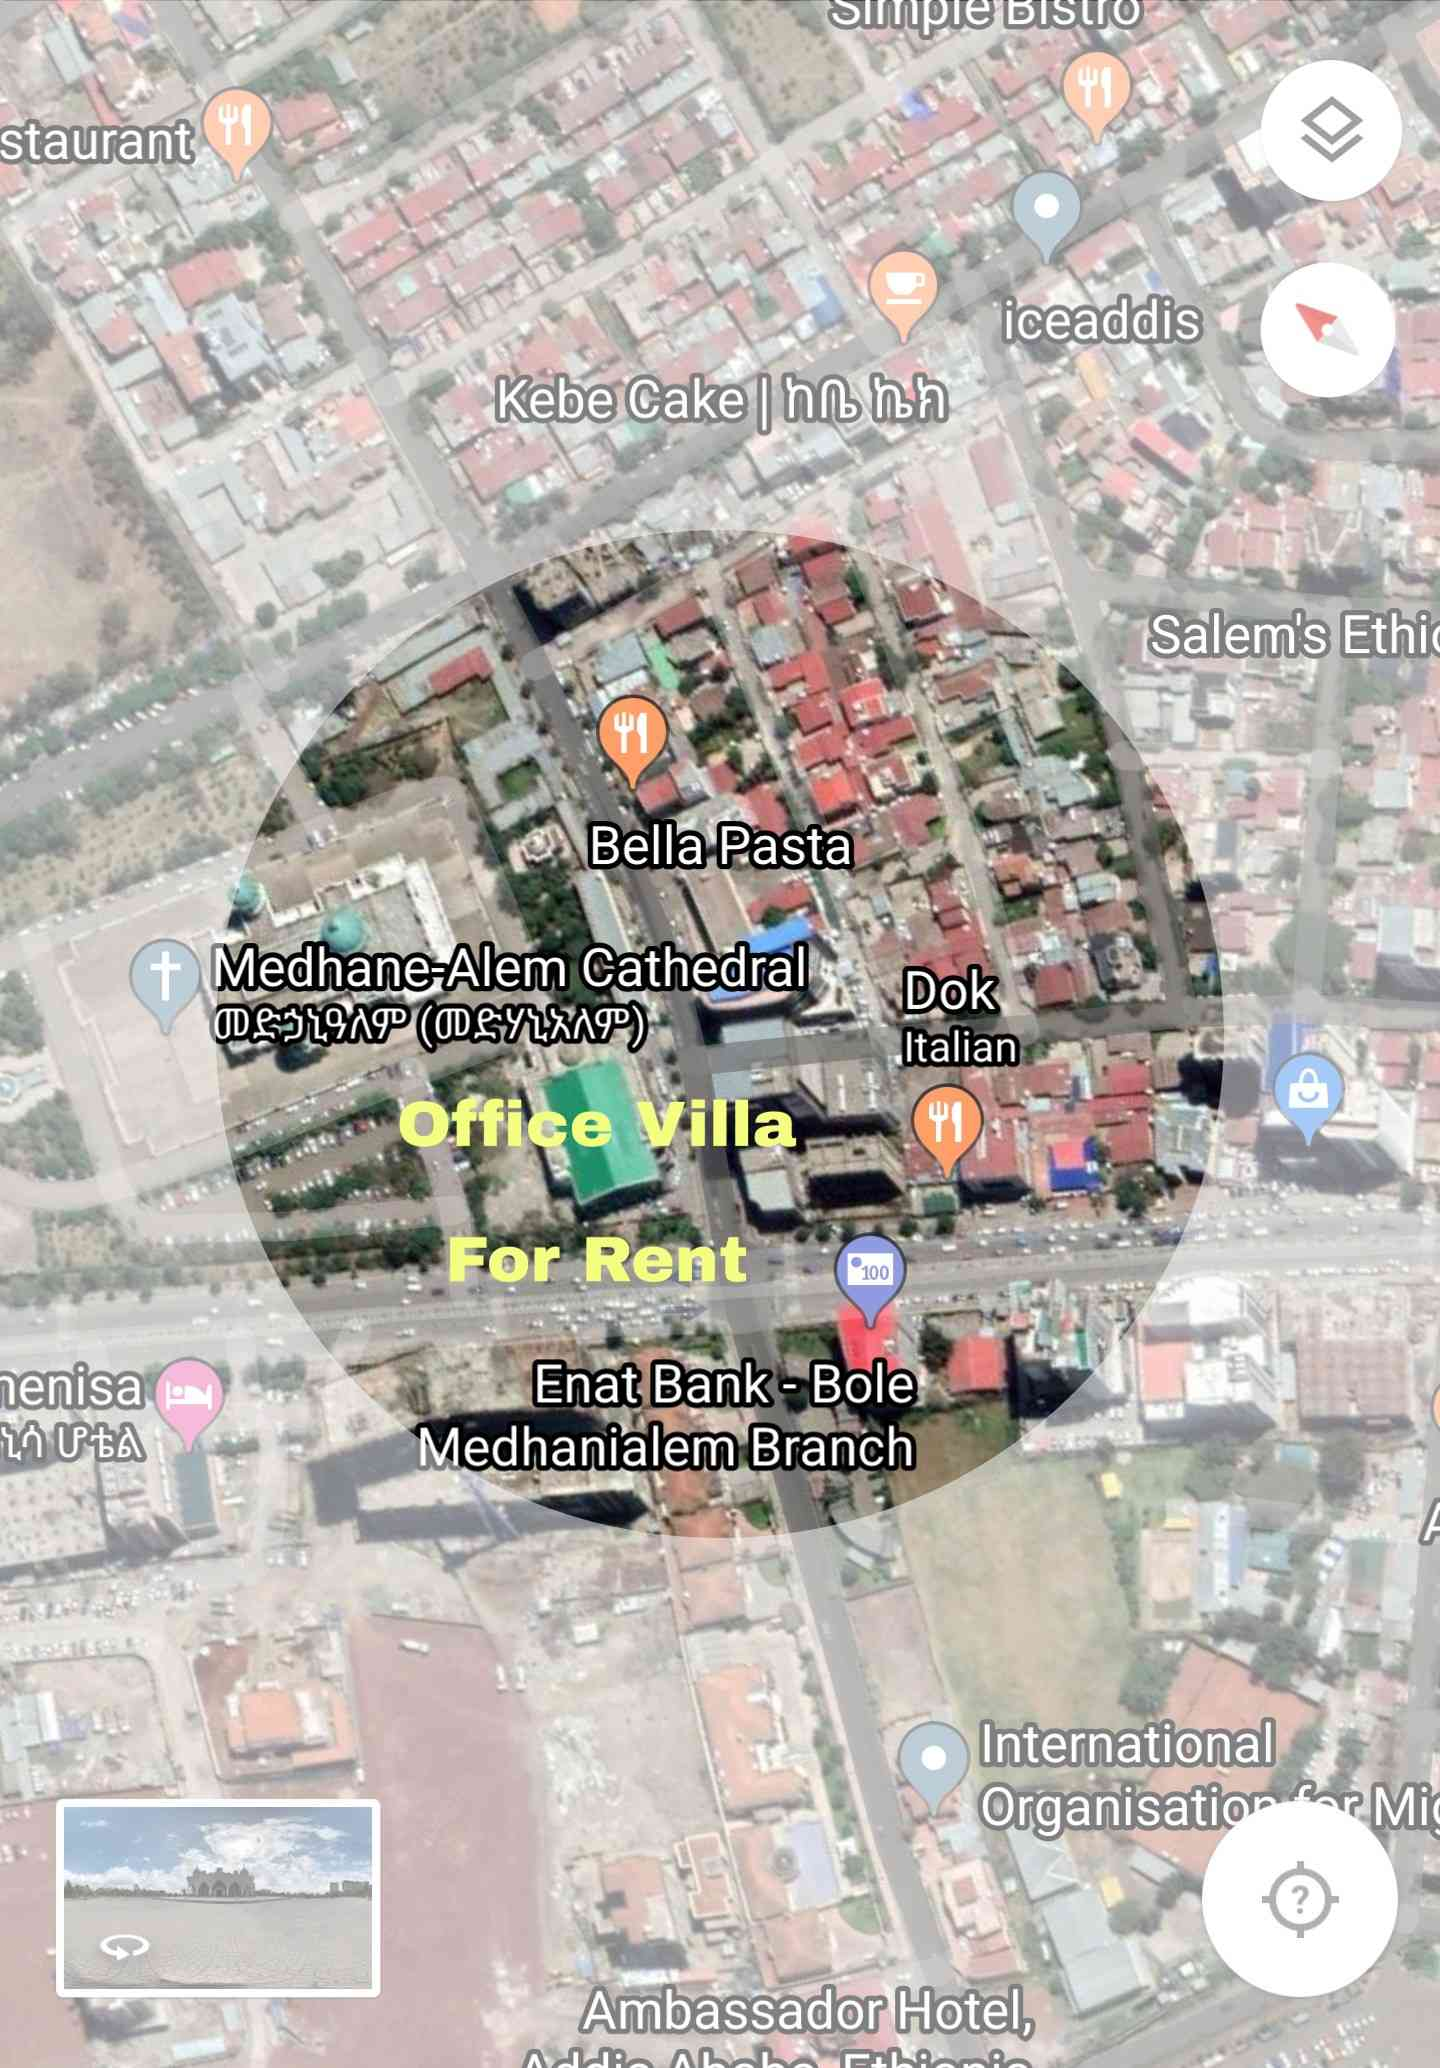 Business/Office Villa For Rent At Bole Medhanialem Main Road